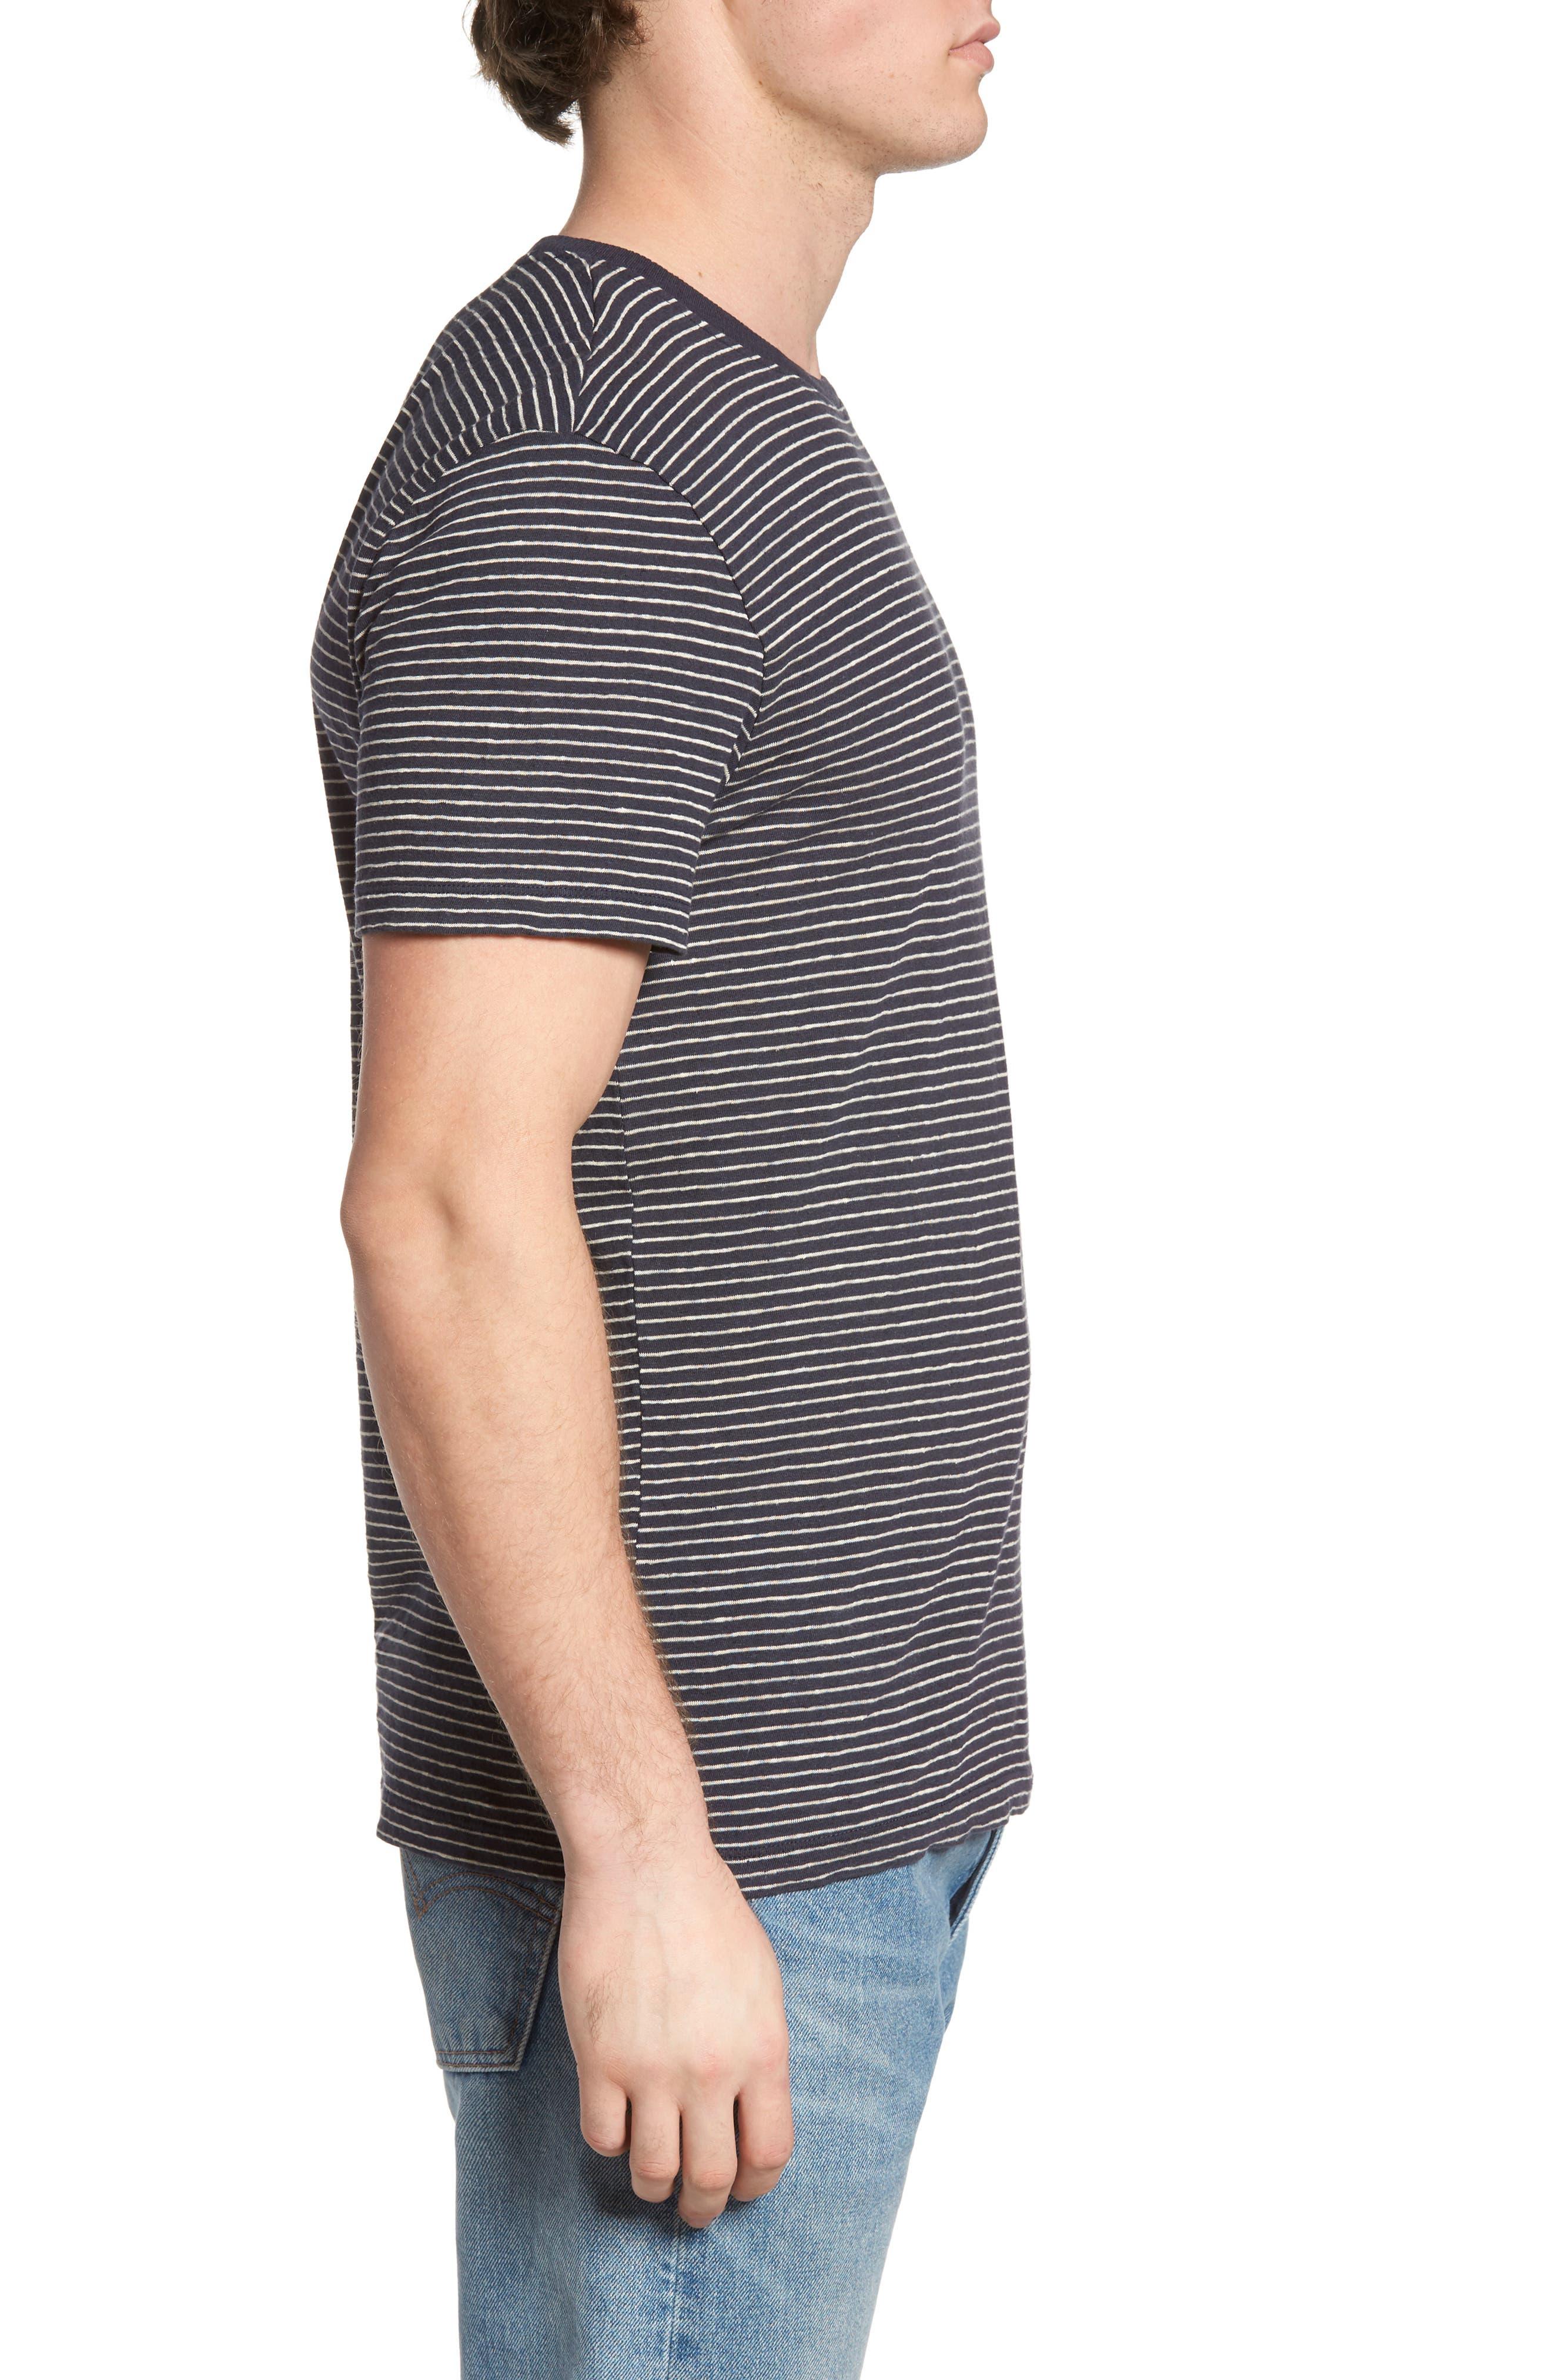 John Rich Stripe Cotton & Linen T-Shirt,                             Alternate thumbnail 3, color,                             Dark Navy Stripe B